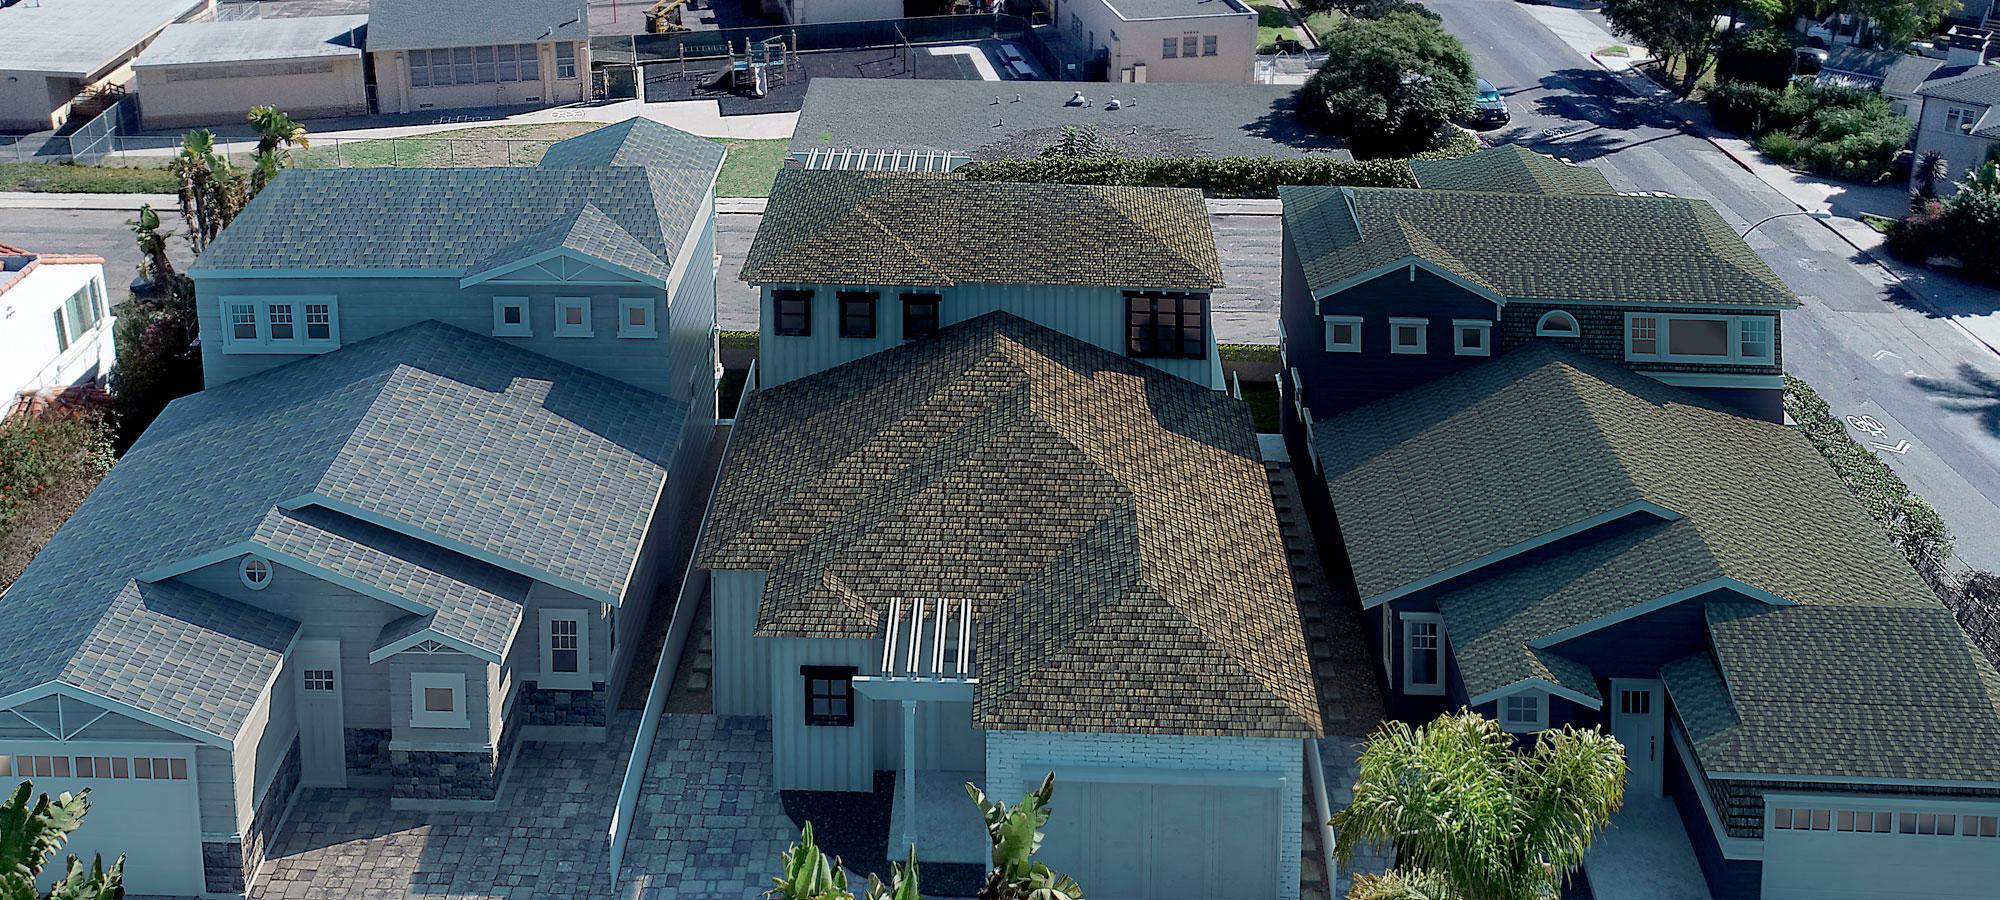 1014 Evergreen St, San Diego, CA 92106